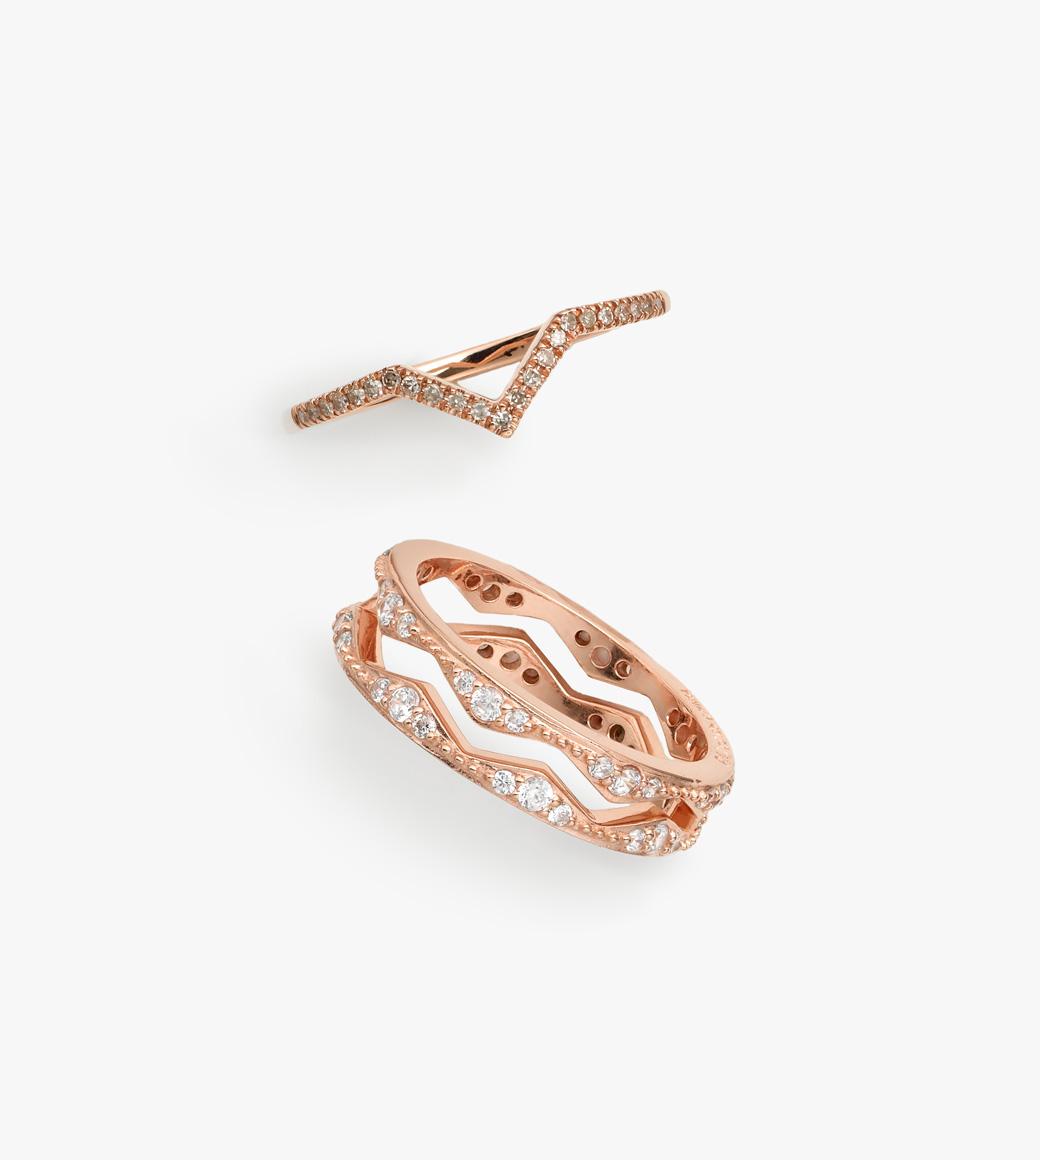 Amazon Gold Jewelry Women S Fashion